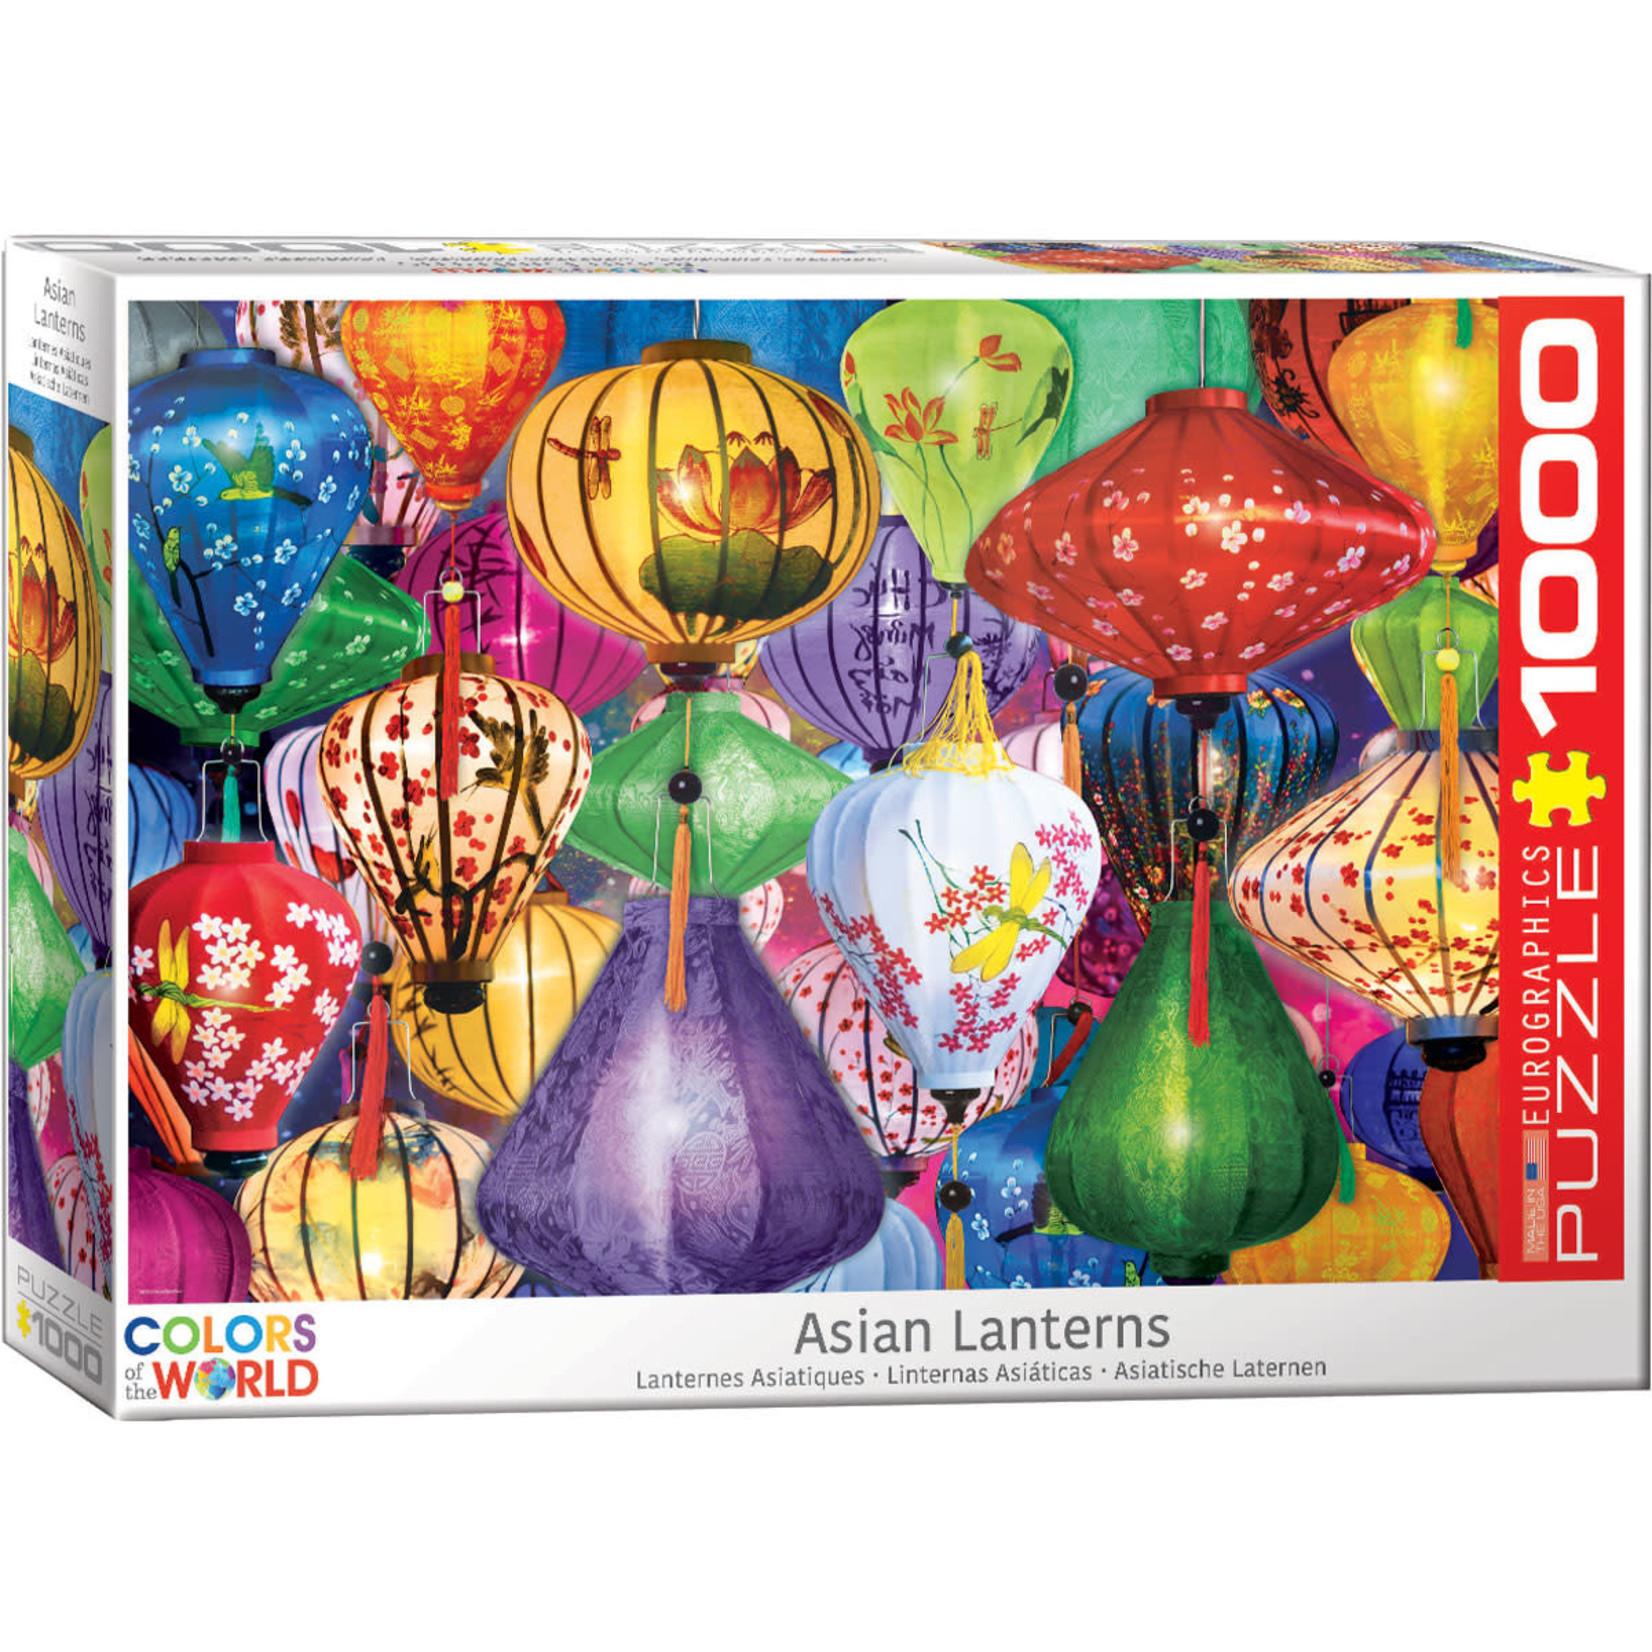 Eurographics Eurographics Puzzle: - Asian Lanterns 1000pc